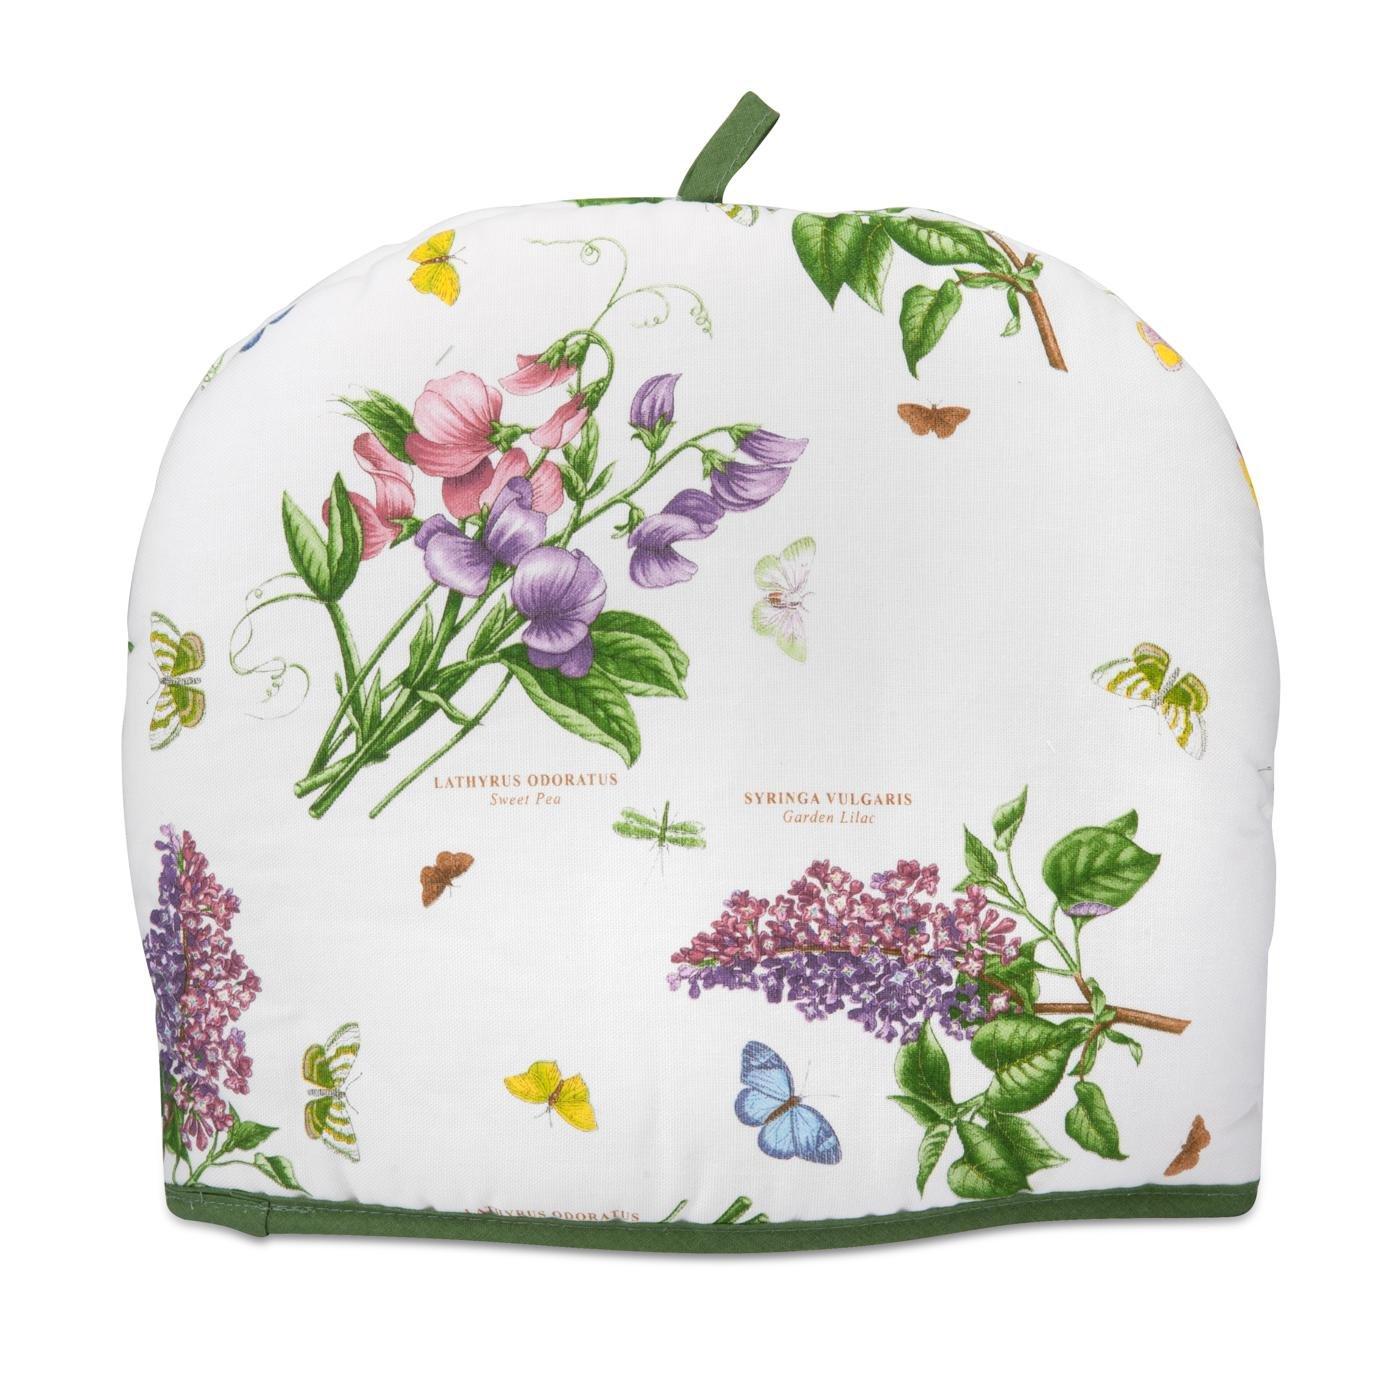 Portmeirion Botanic Garden Tea Cosy by Pimpernel (Image #1)